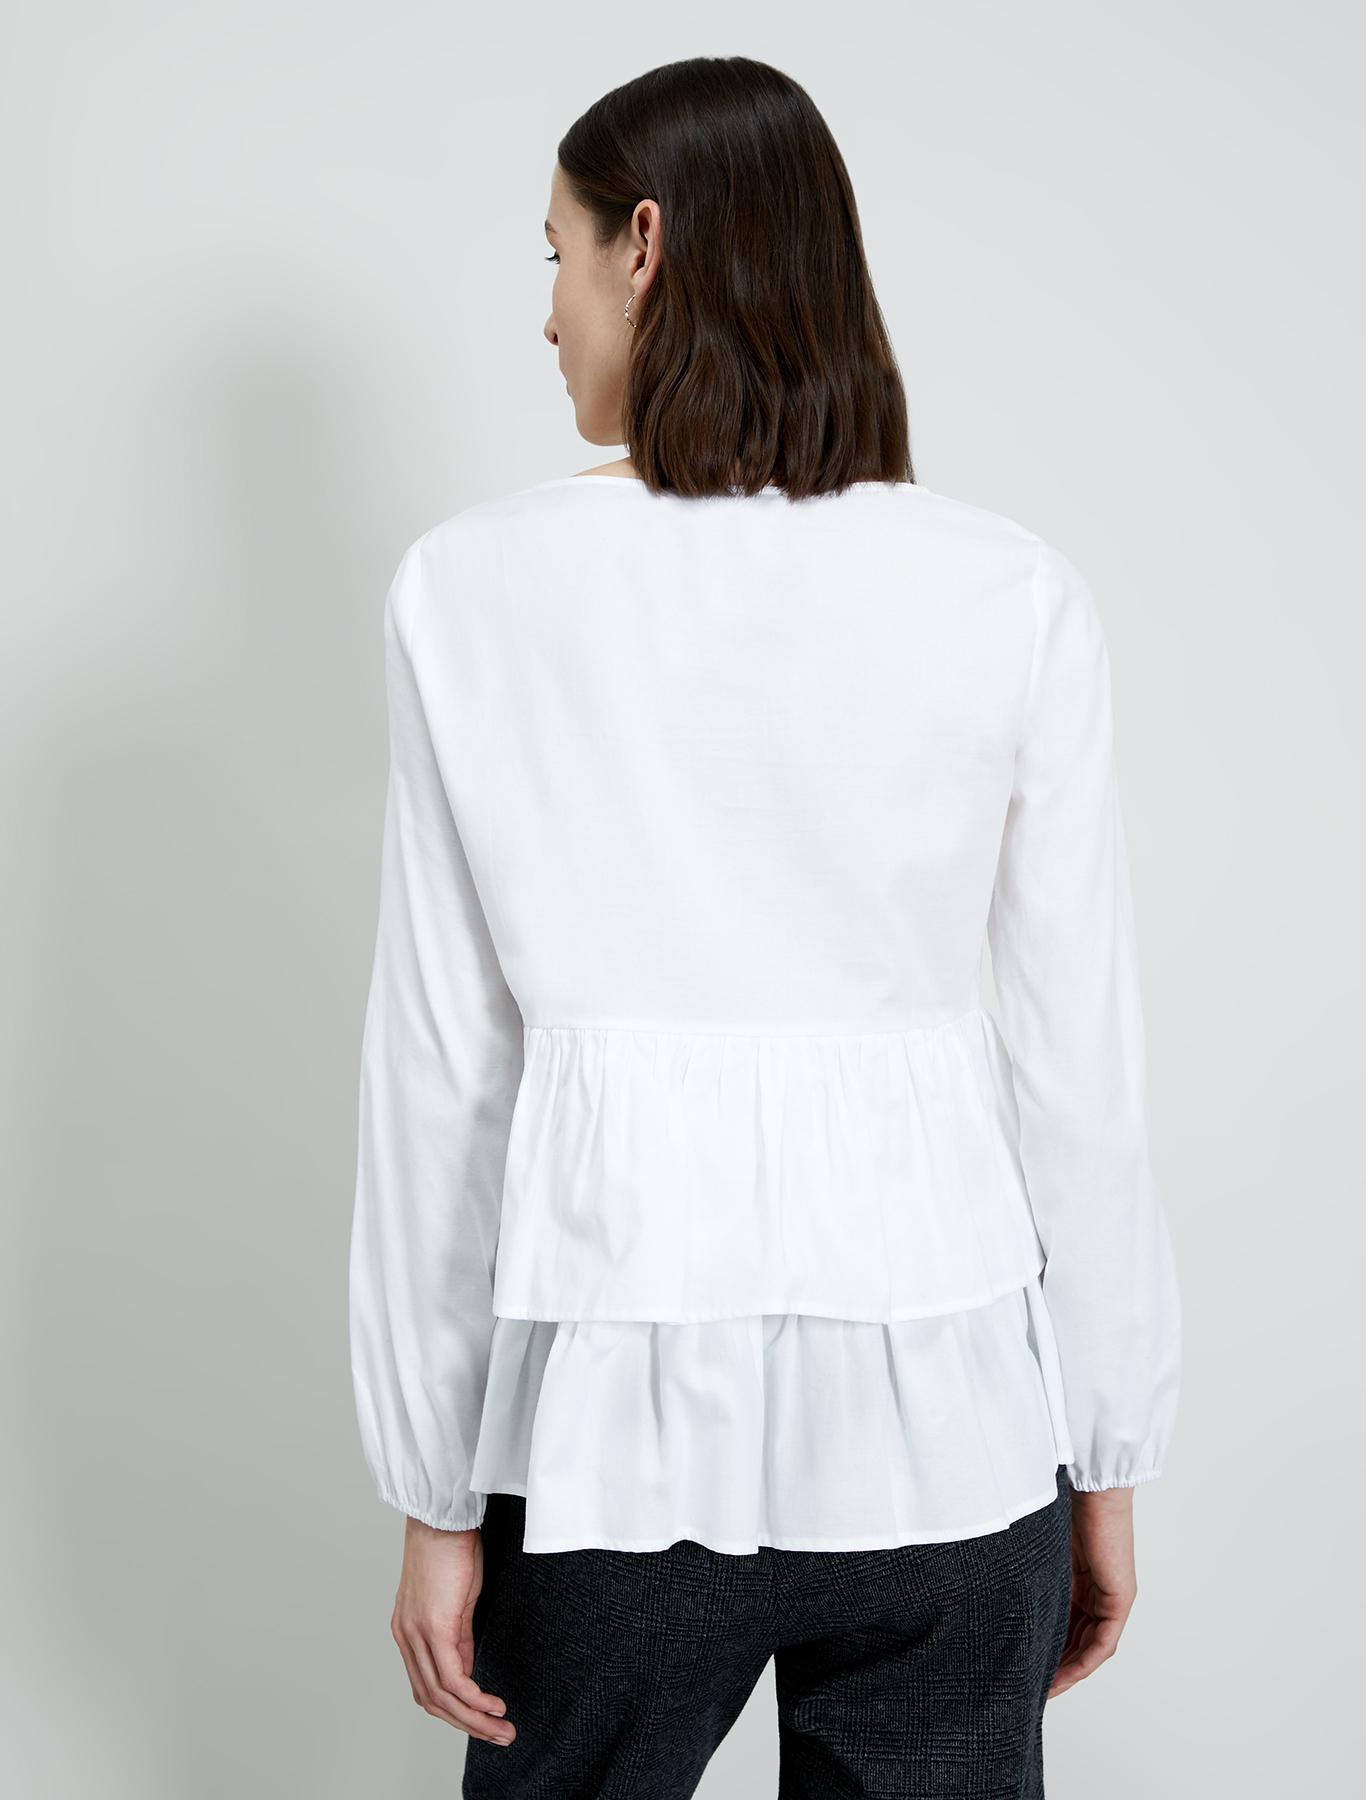 Cotton blouse with flounces - white - pennyblack